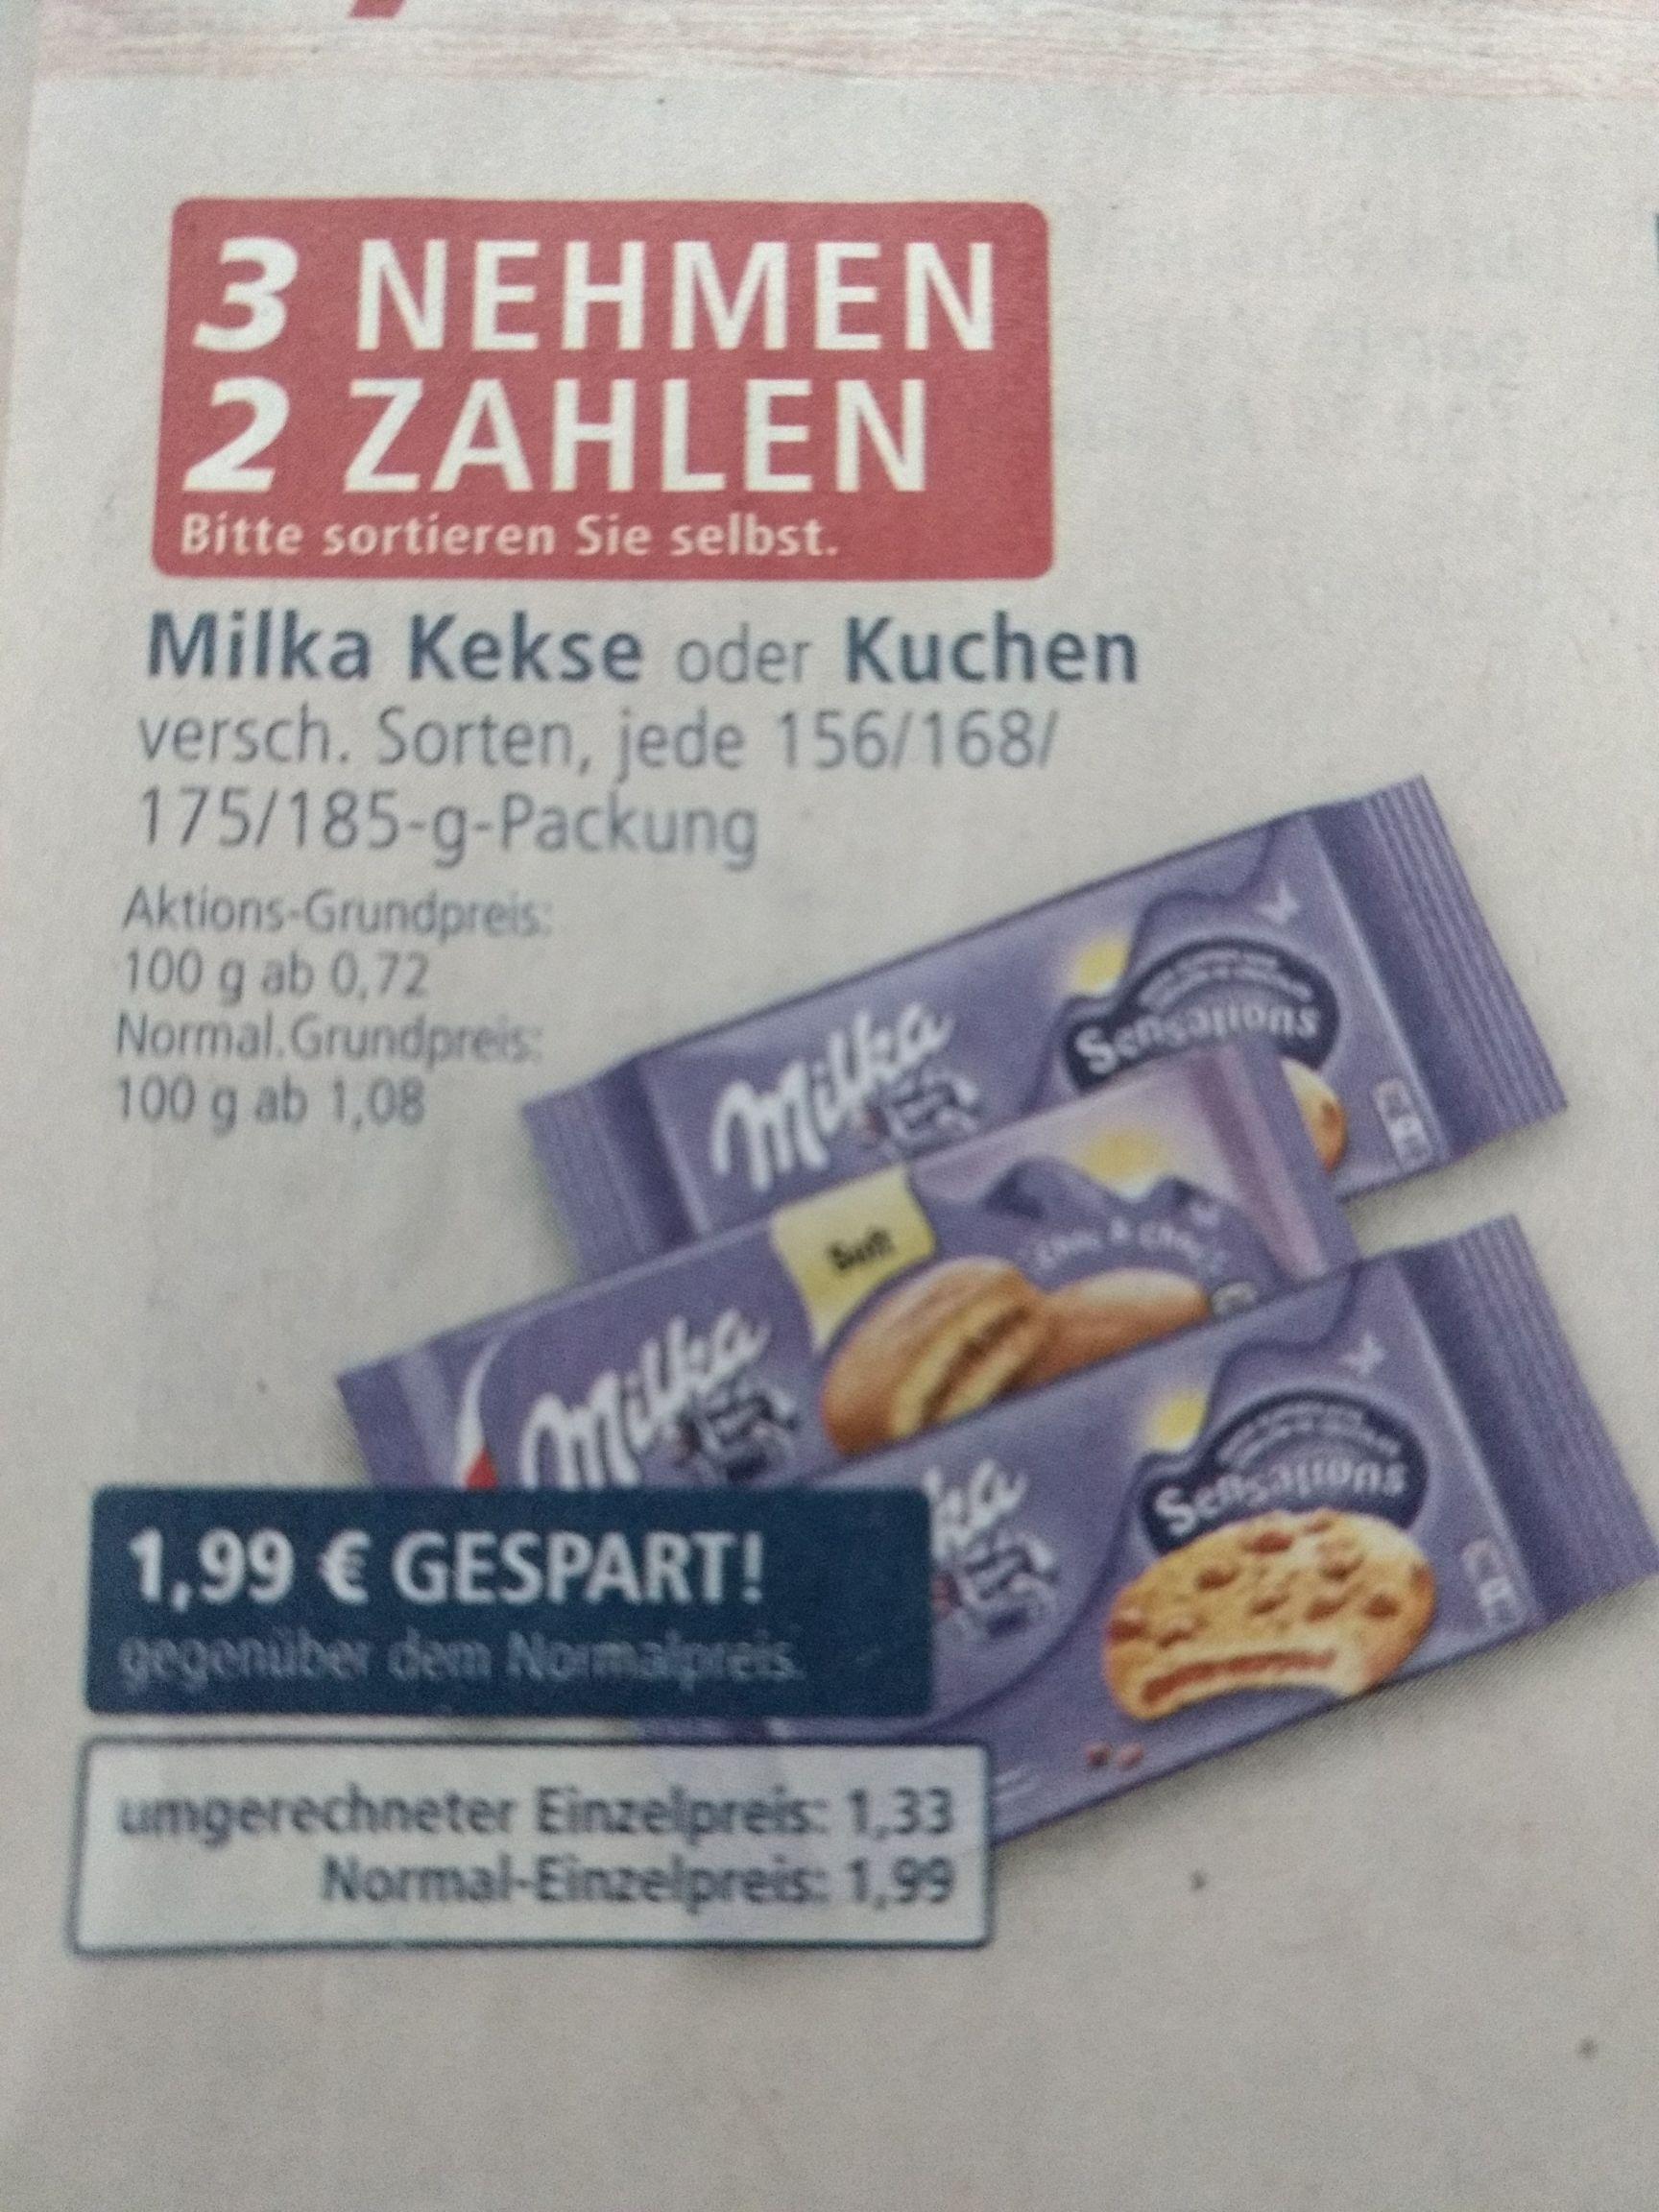 [Real] Milka Kekse/Kuchen 3 für 2 Aktion + 1€ Milka Coupon - effektiv 1 Euro die Packung ab 3 Stück